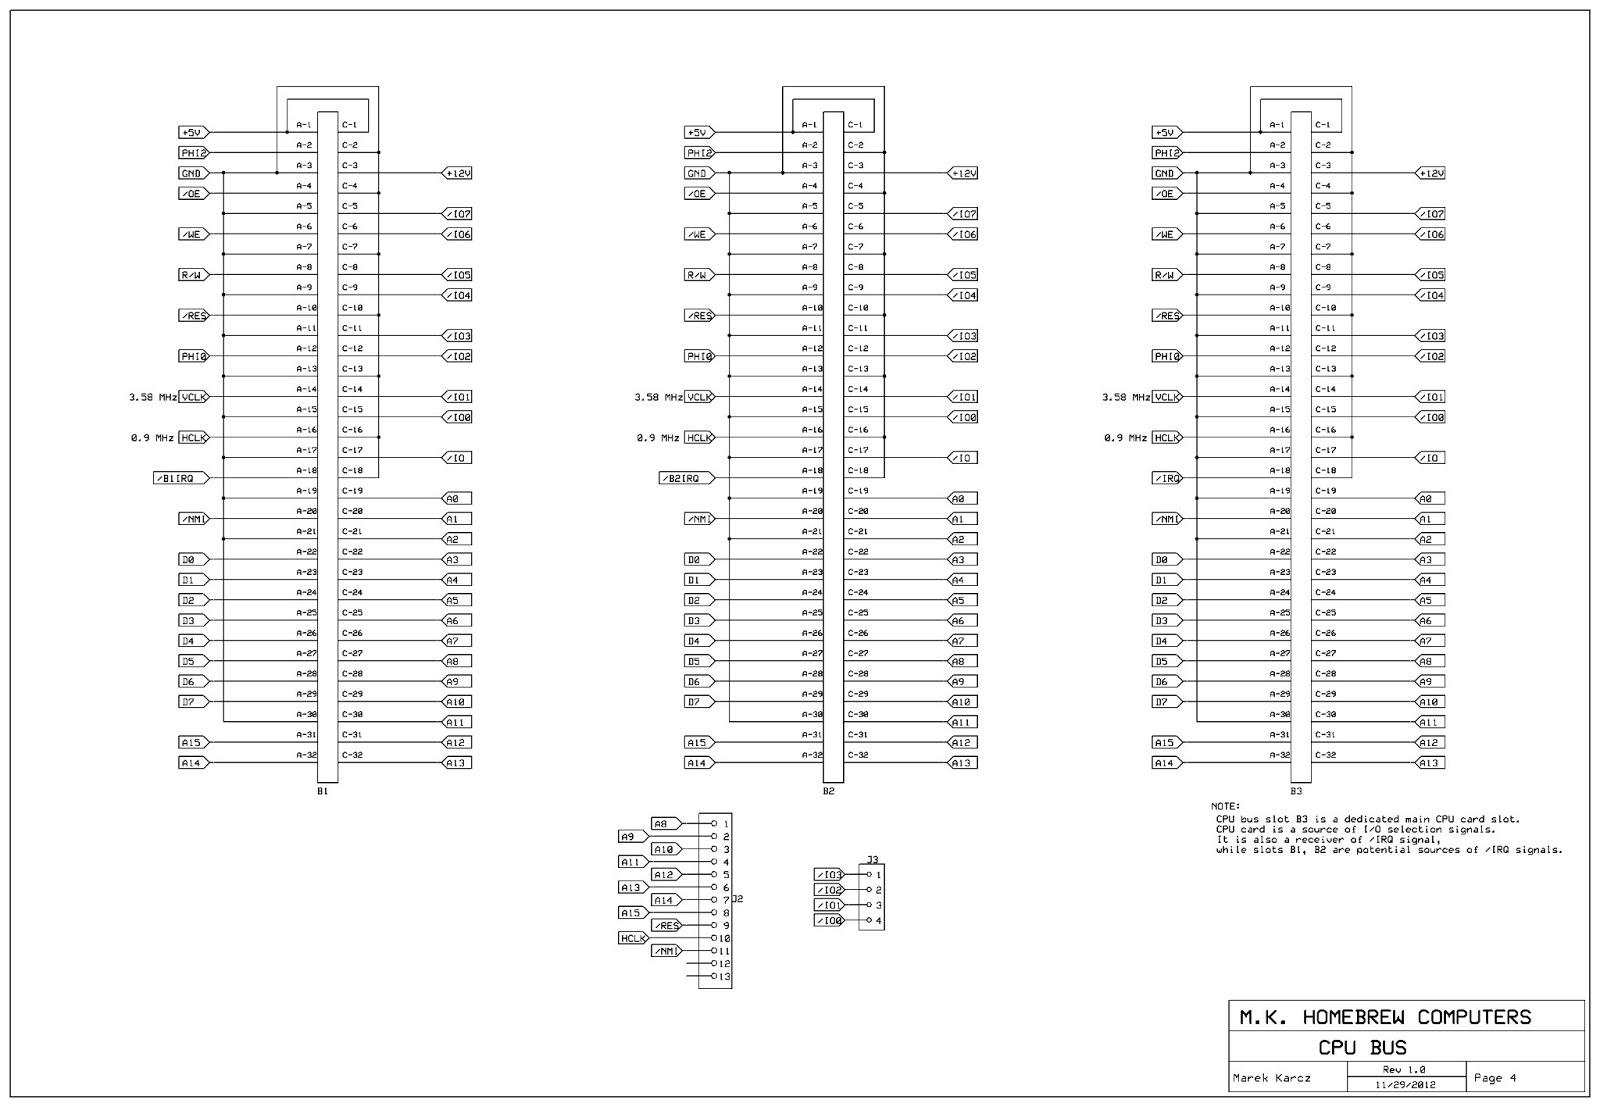 Homebrew Computers: MKHBC-8-R1 homebrew 6502 computer